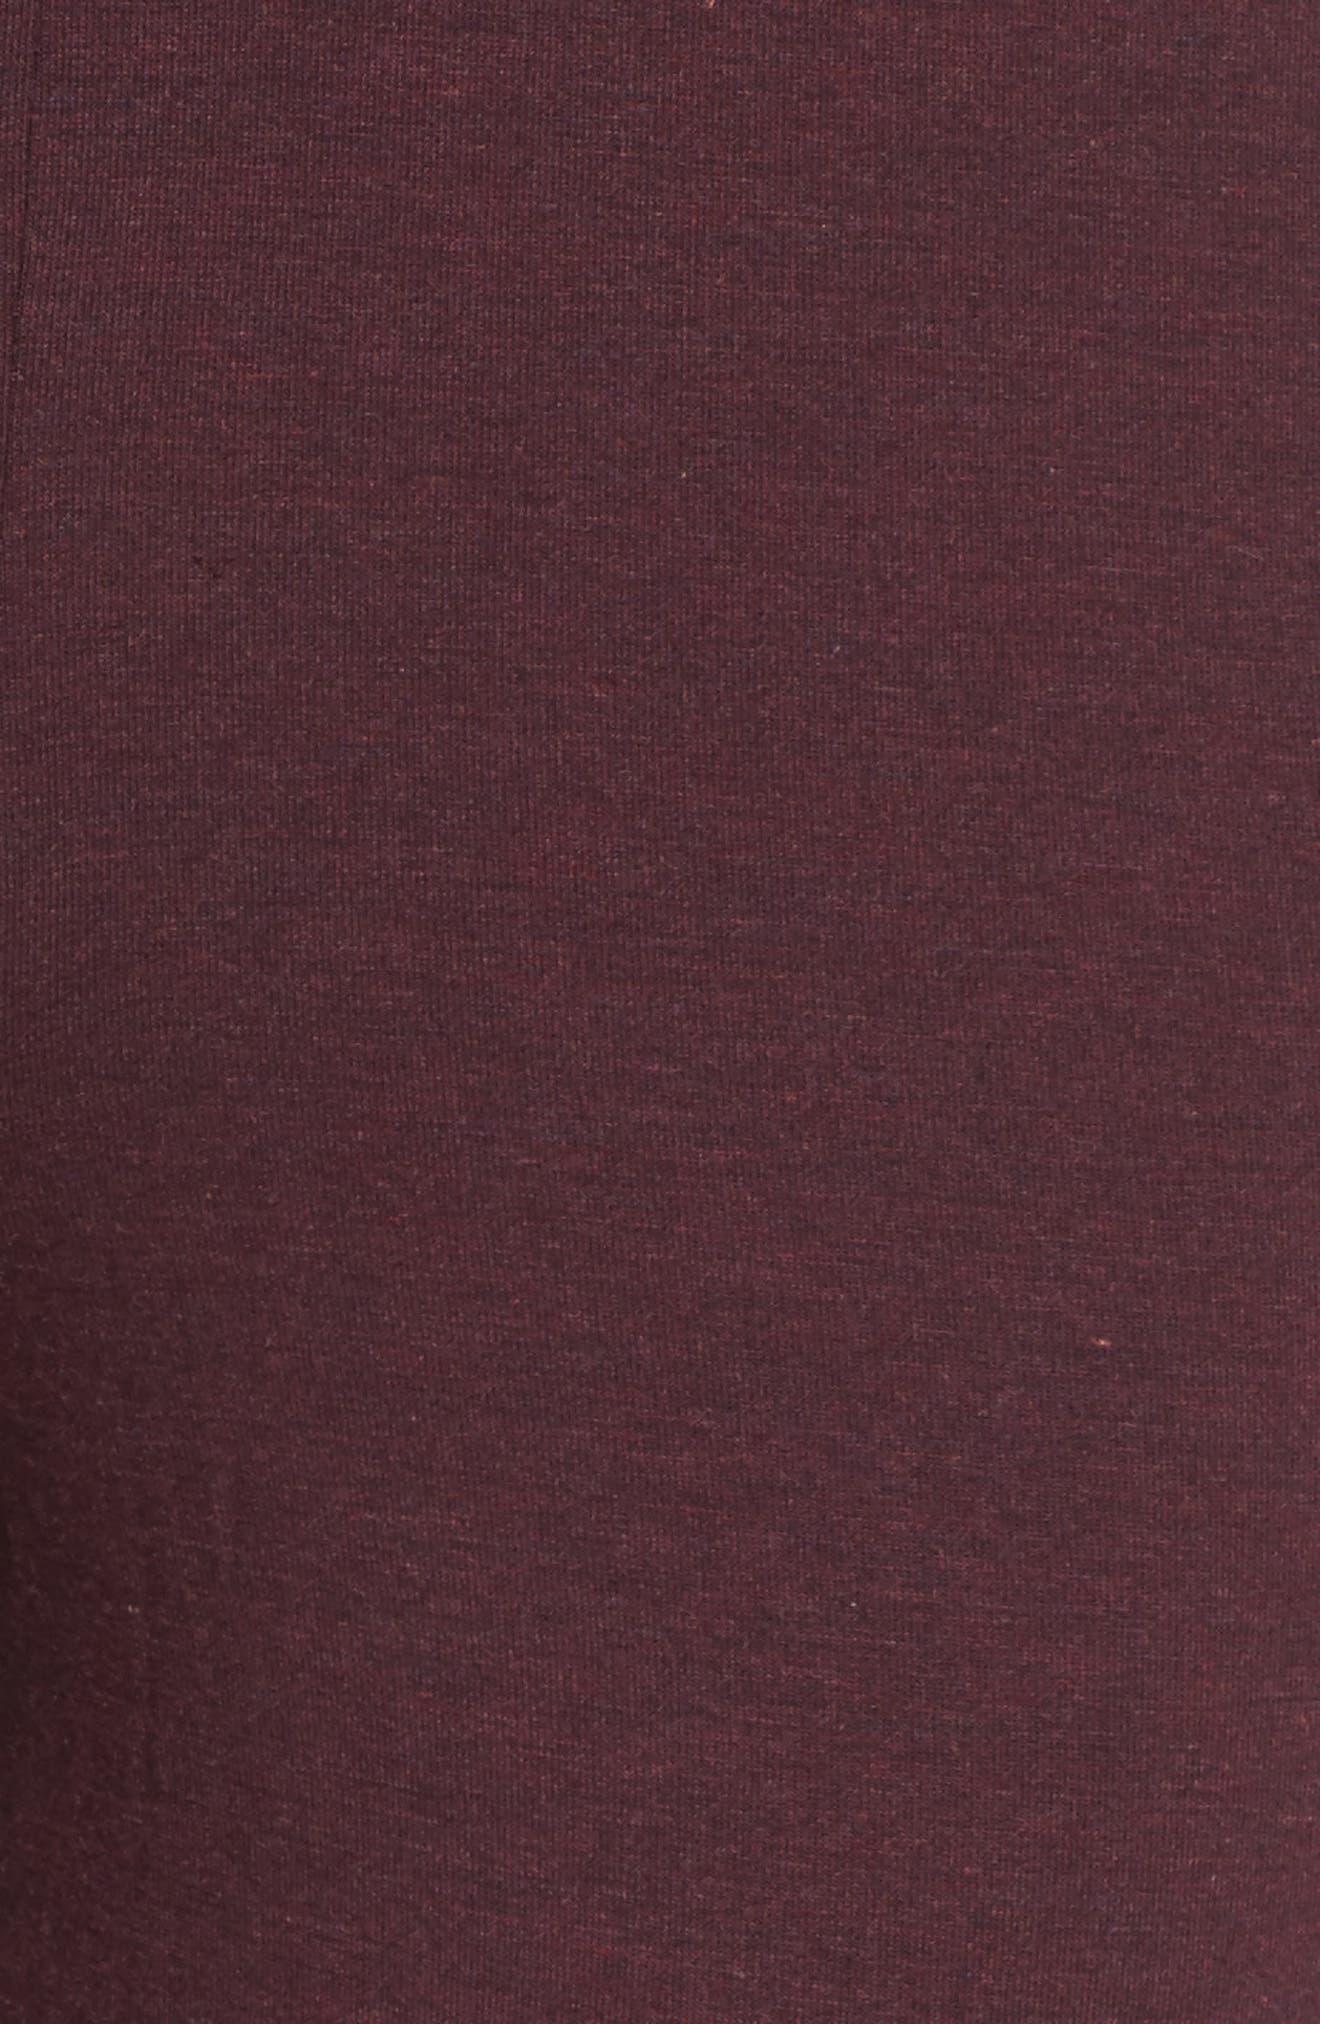 Jersey Lounge Pants,                             Alternate thumbnail 5, color,                             930